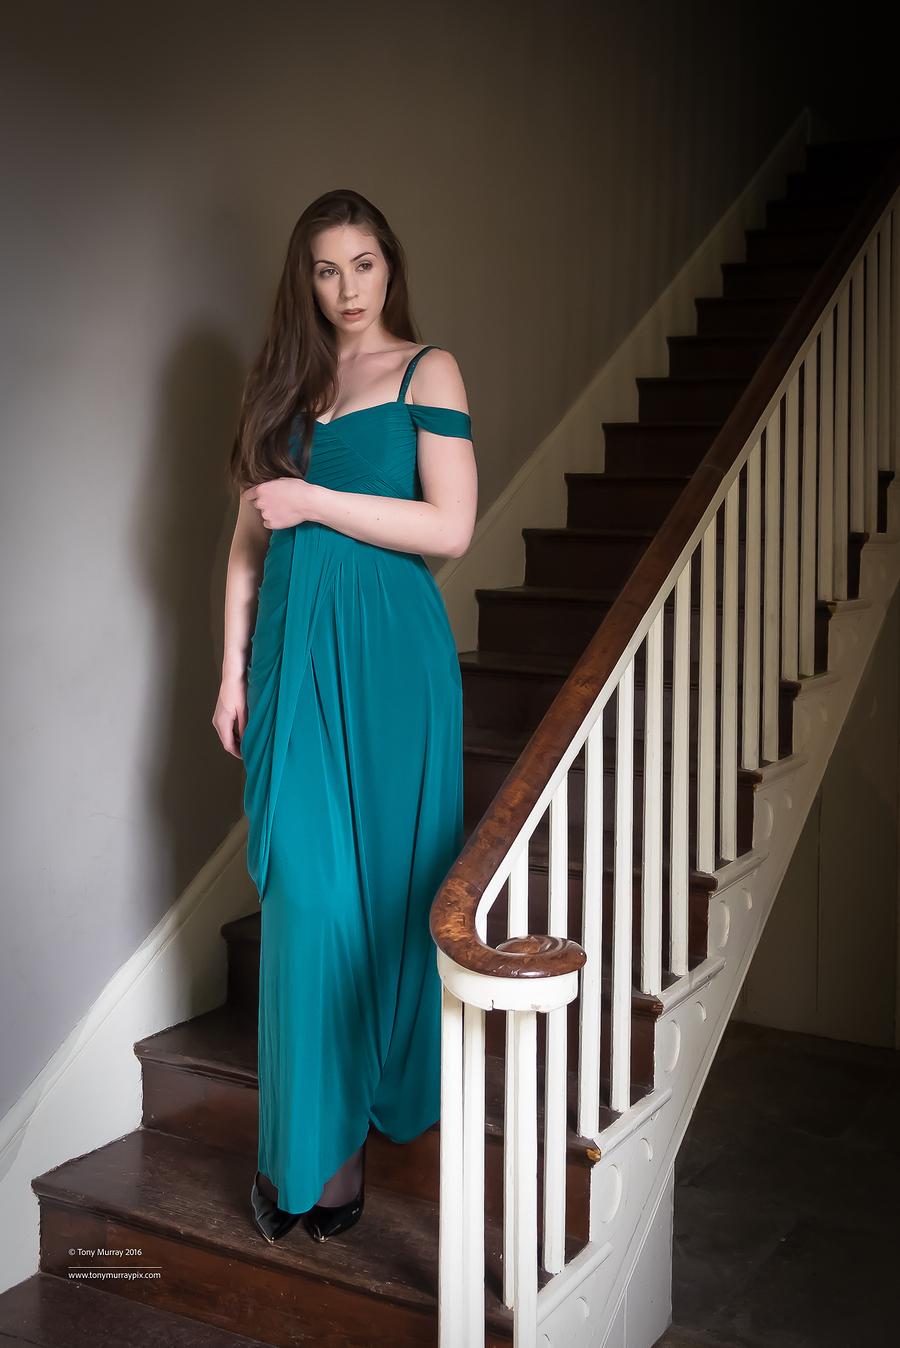 Elegant lady / Photography by Tony Murray Pix, Model Elle Beth / Uploaded 12th October 2016 @ 09:47 PM